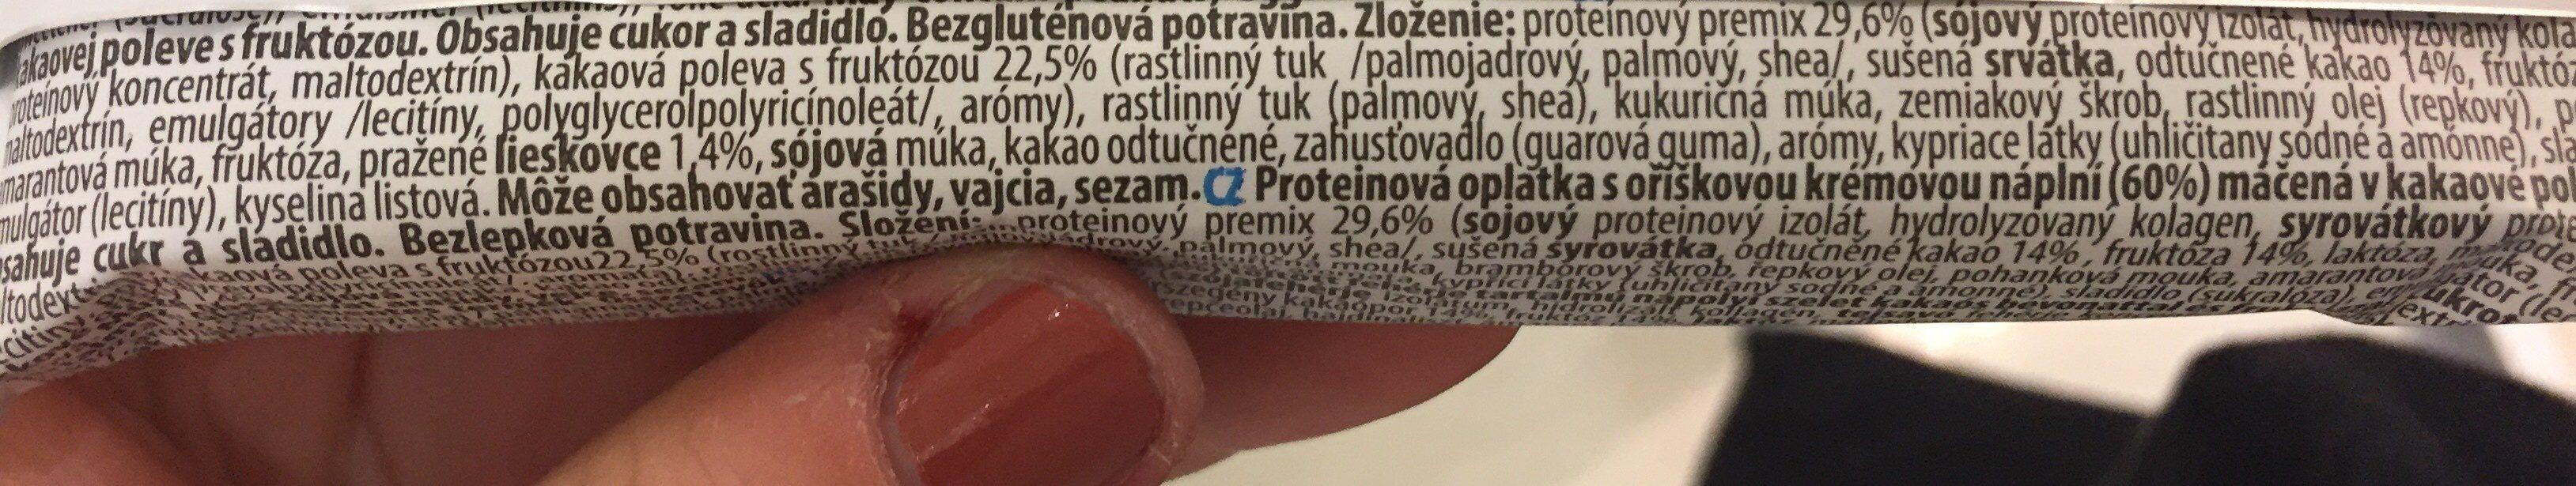 Protein nuts - Ingrédients - fr